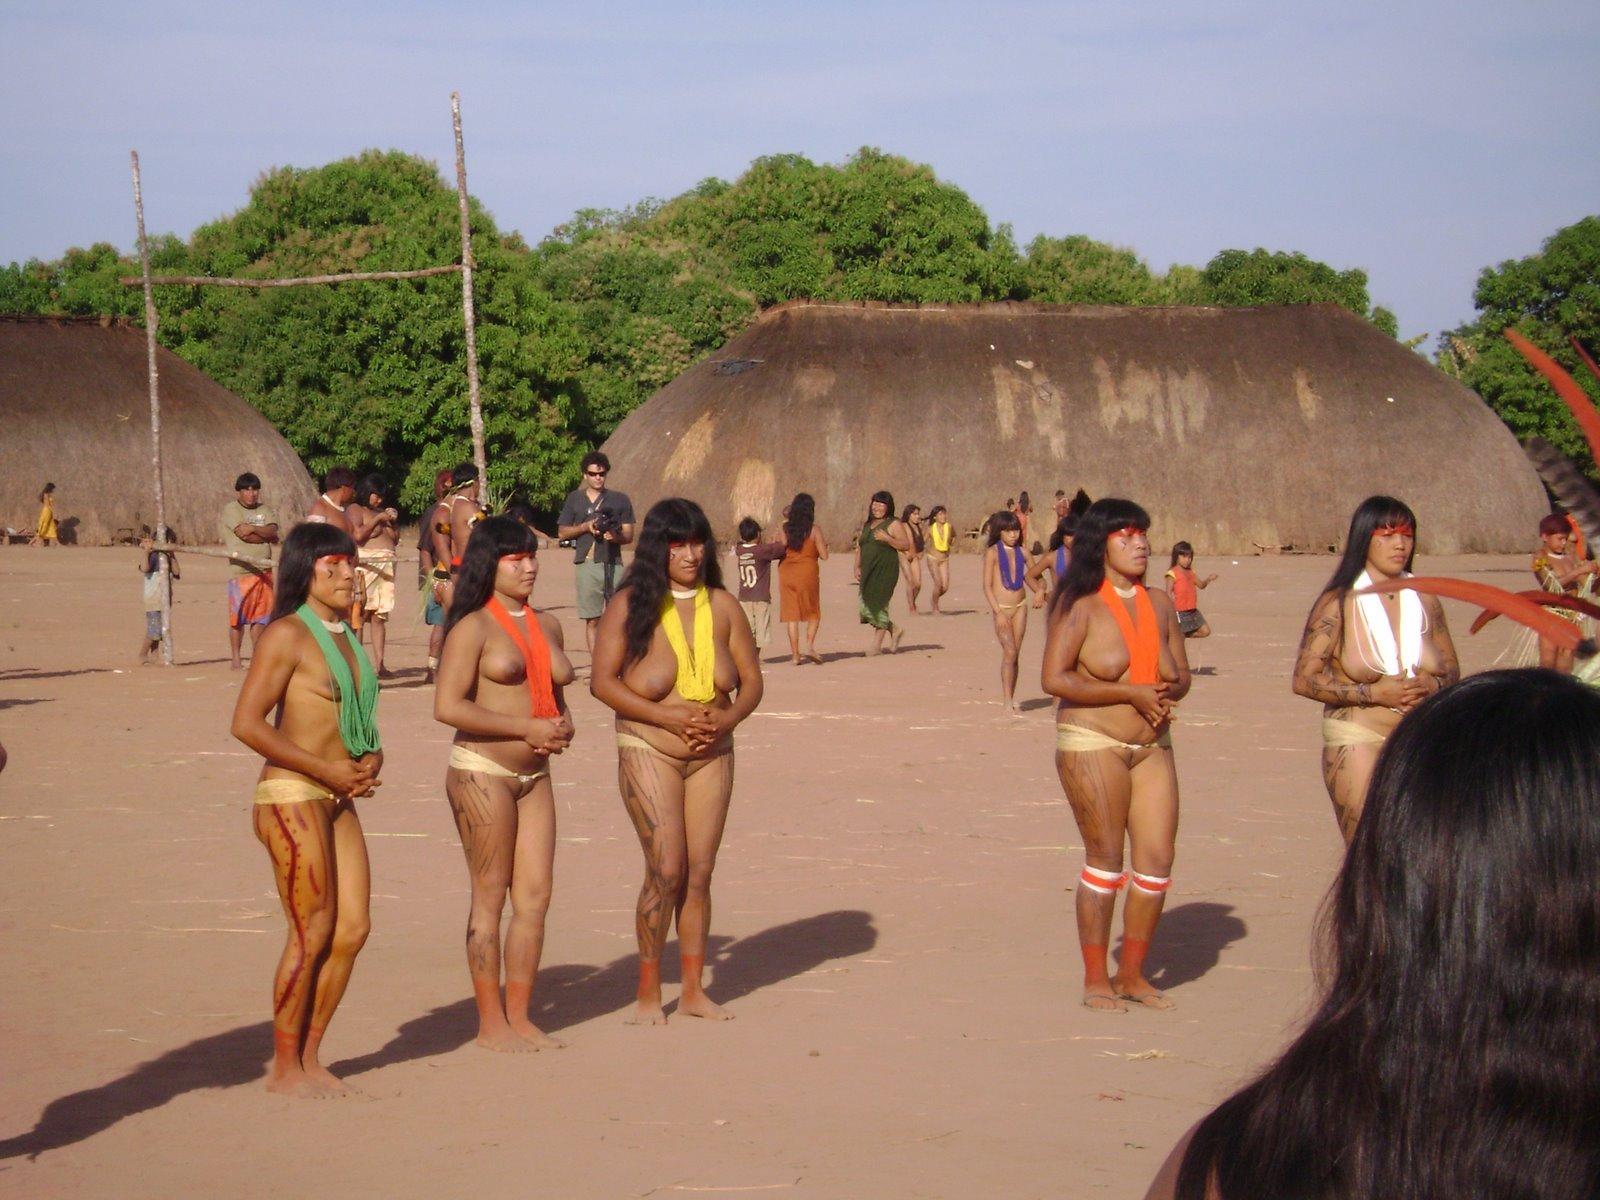 Xingu Girl Nude Sex - Image 4 Fap-3528